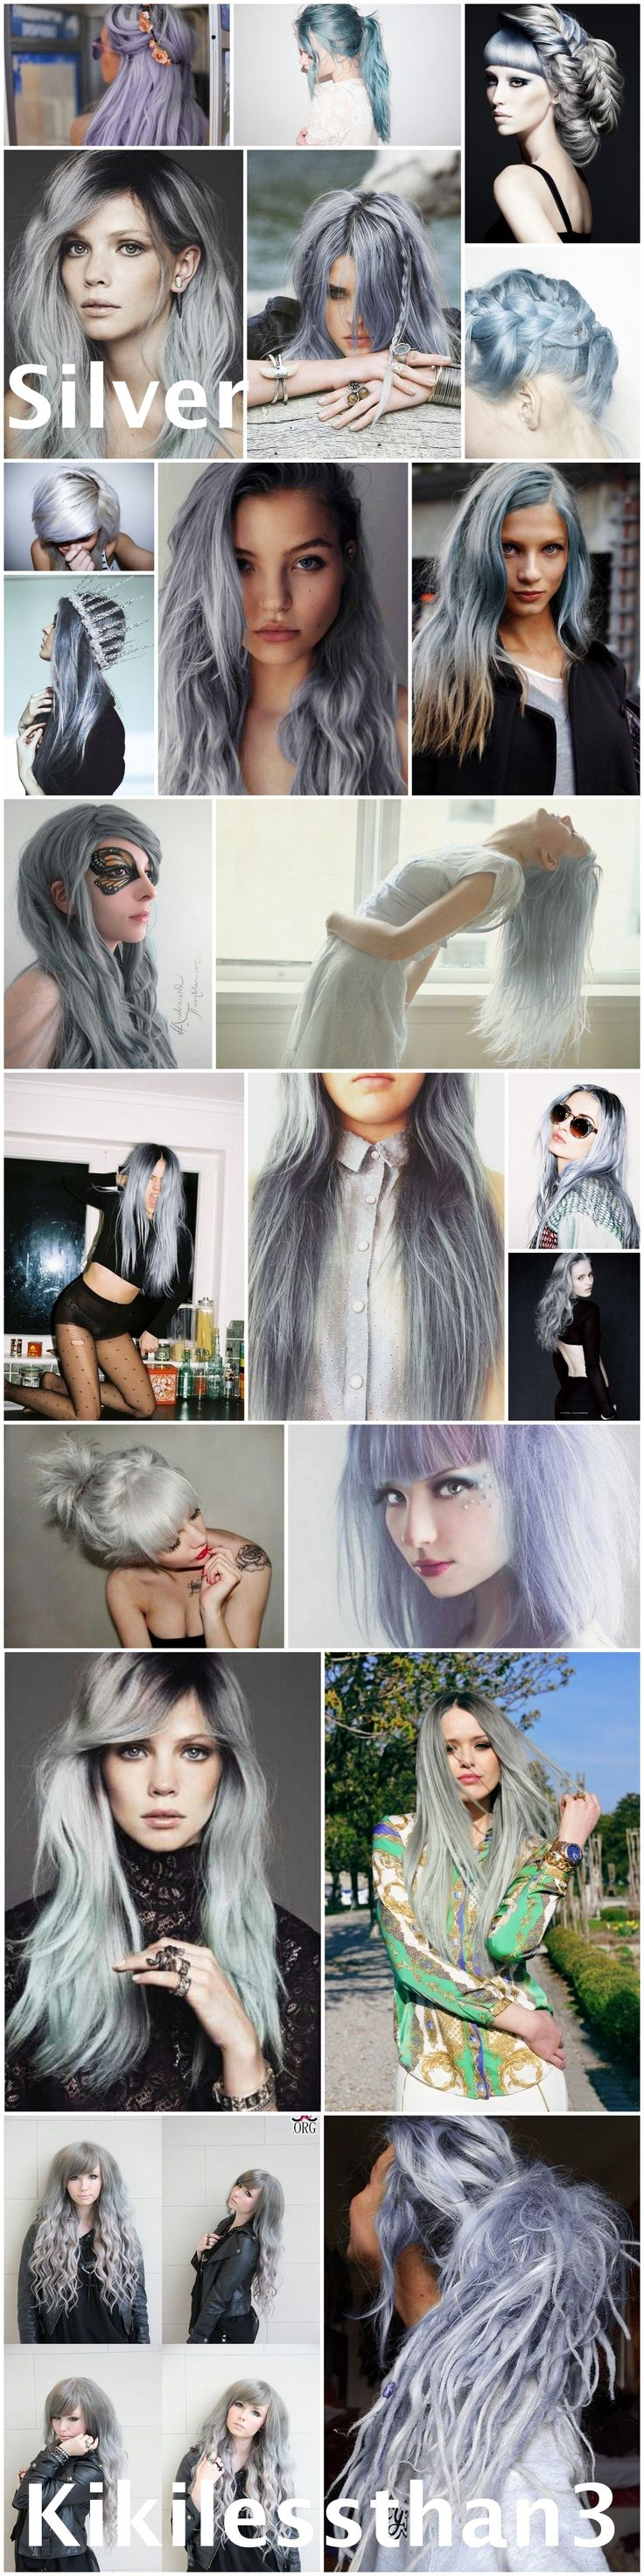 Grey hair, gray hair, silver hair, pastel hair. Ideas for dying your hair silver...